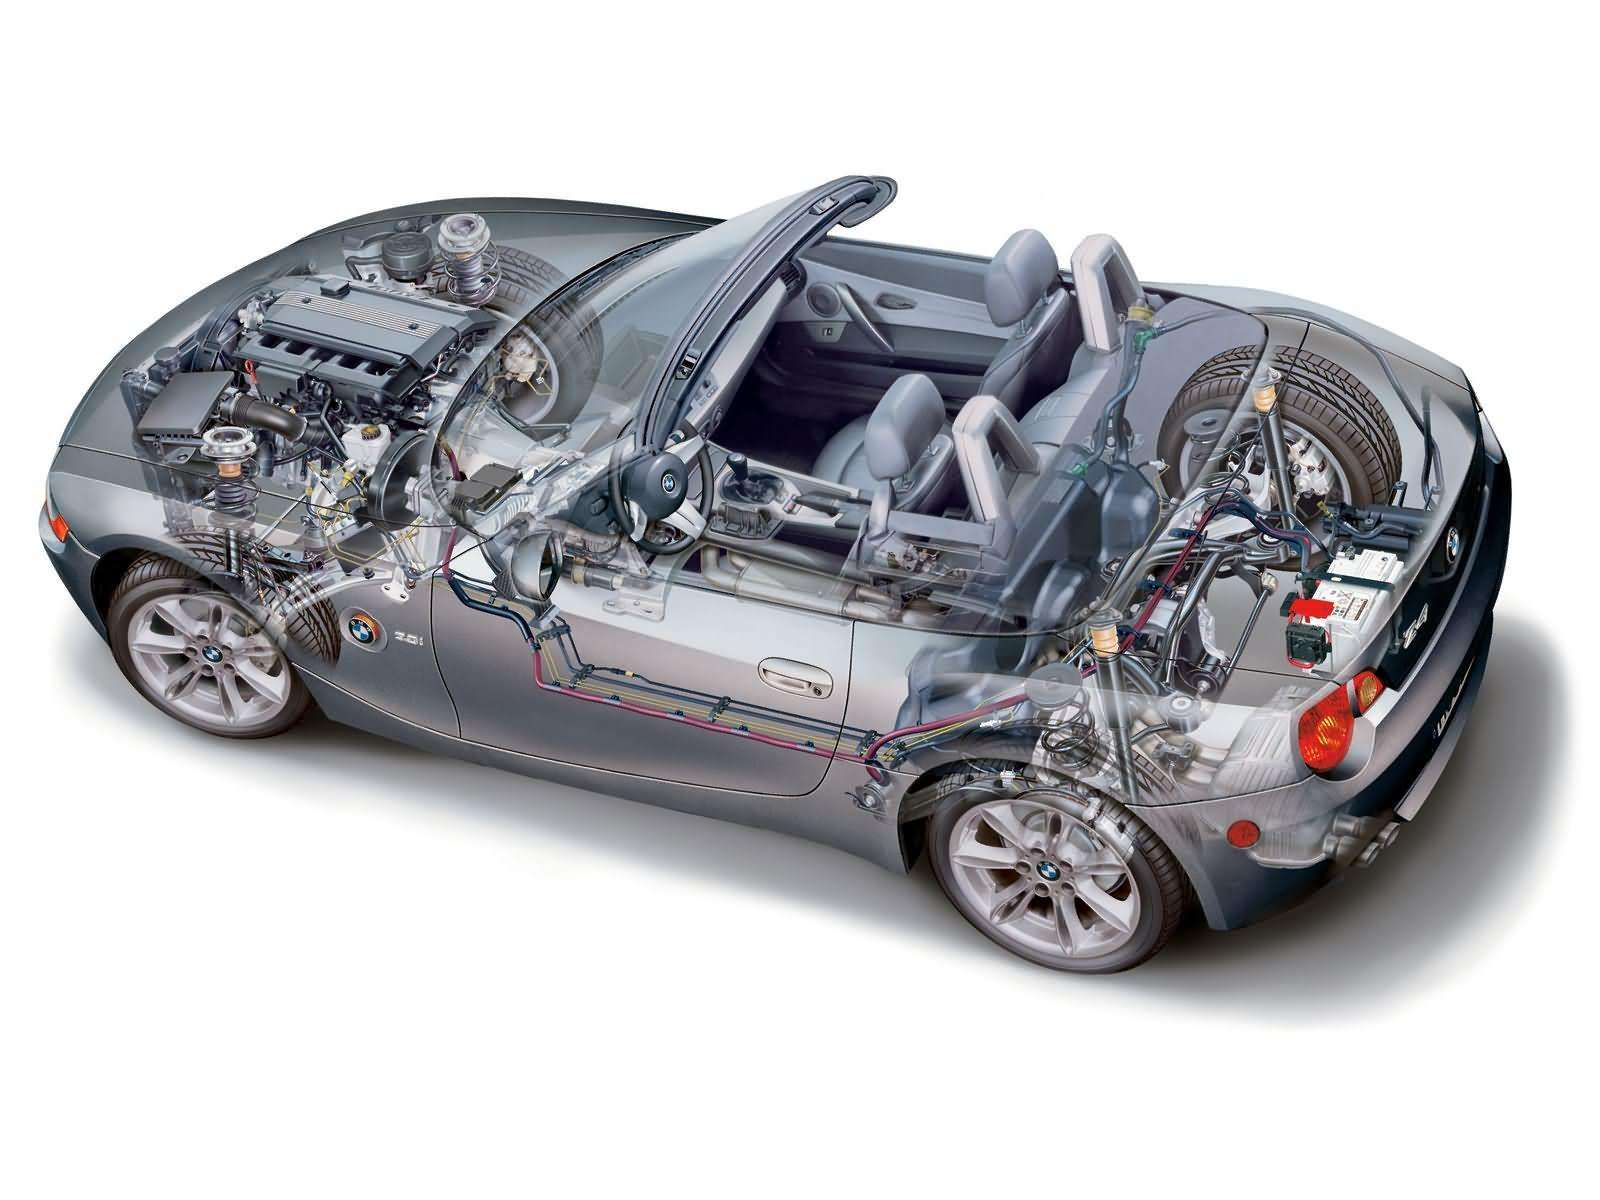 BMW, Z4, BMW Z4, Clive Owen, BMW Films, convertible, roadster, ragtop, sports car, two seater, classic car, retro car, modern classic, cheap car, bargain car, featured, motoring, automotive, ebay, ebay motors, autotrader, car, cars